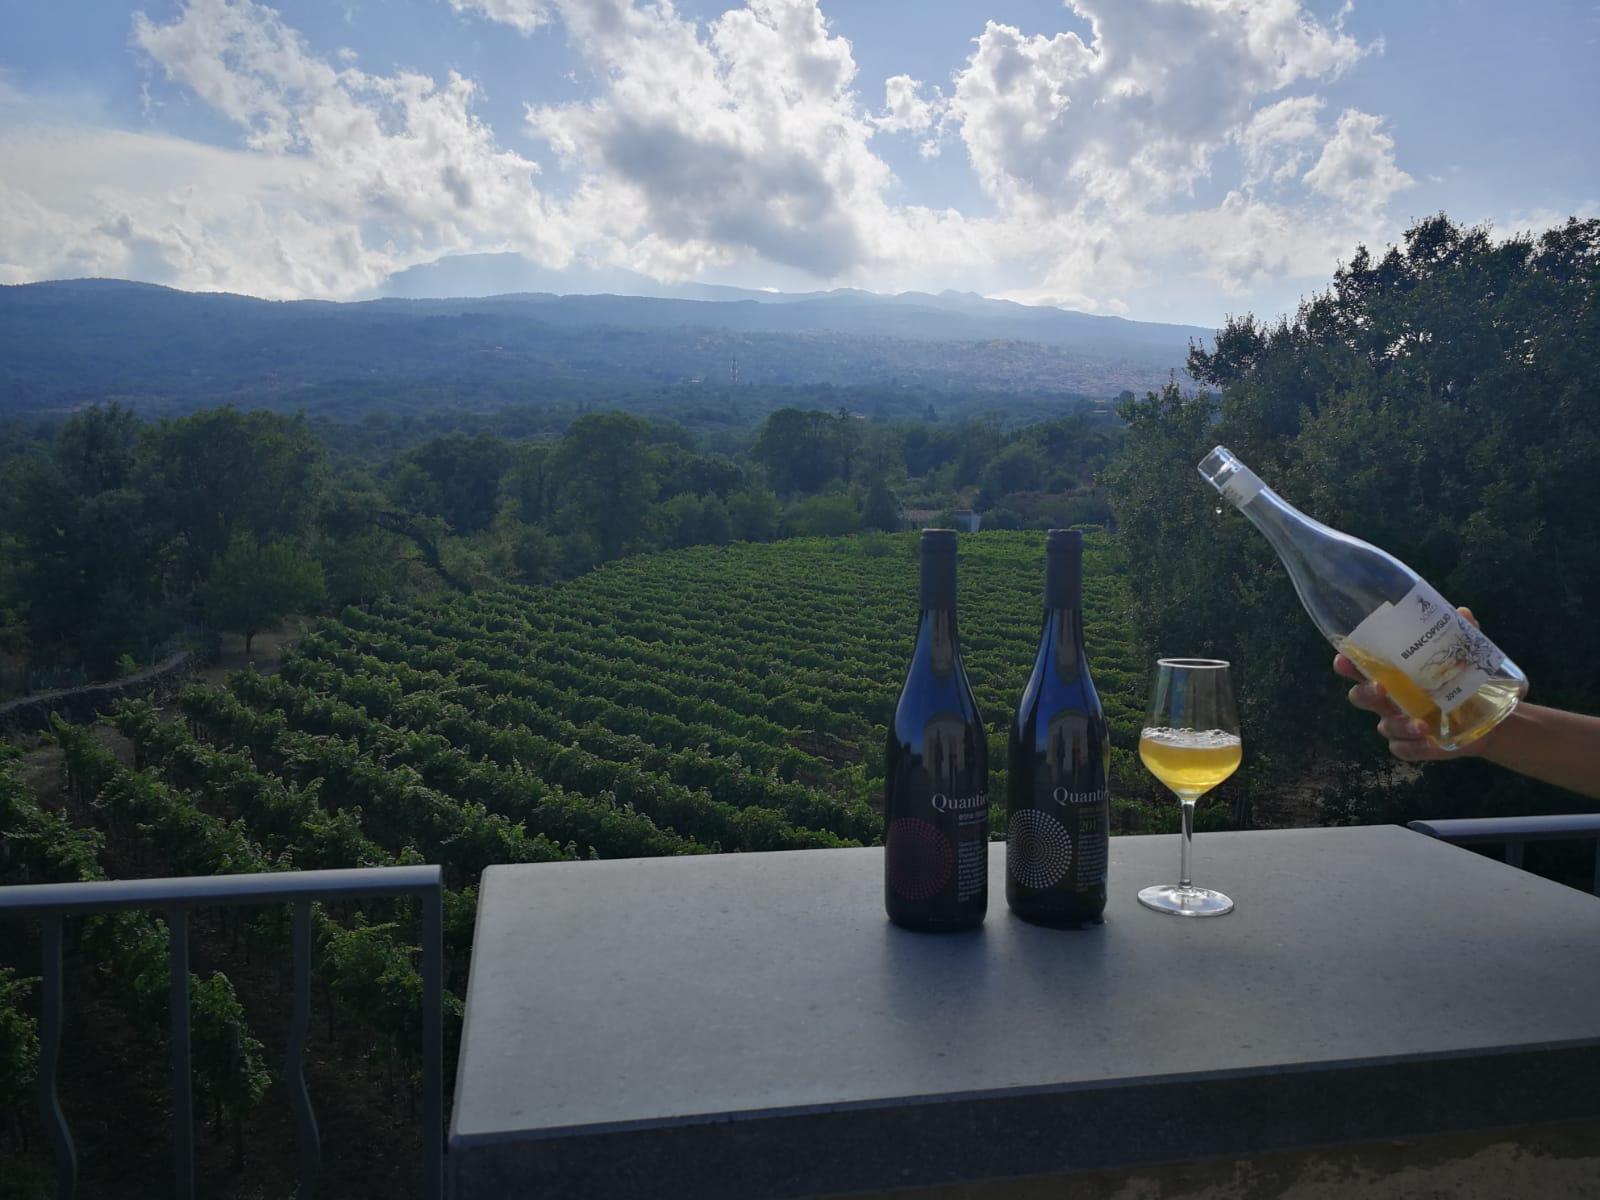 Biancopiglio vino blanco